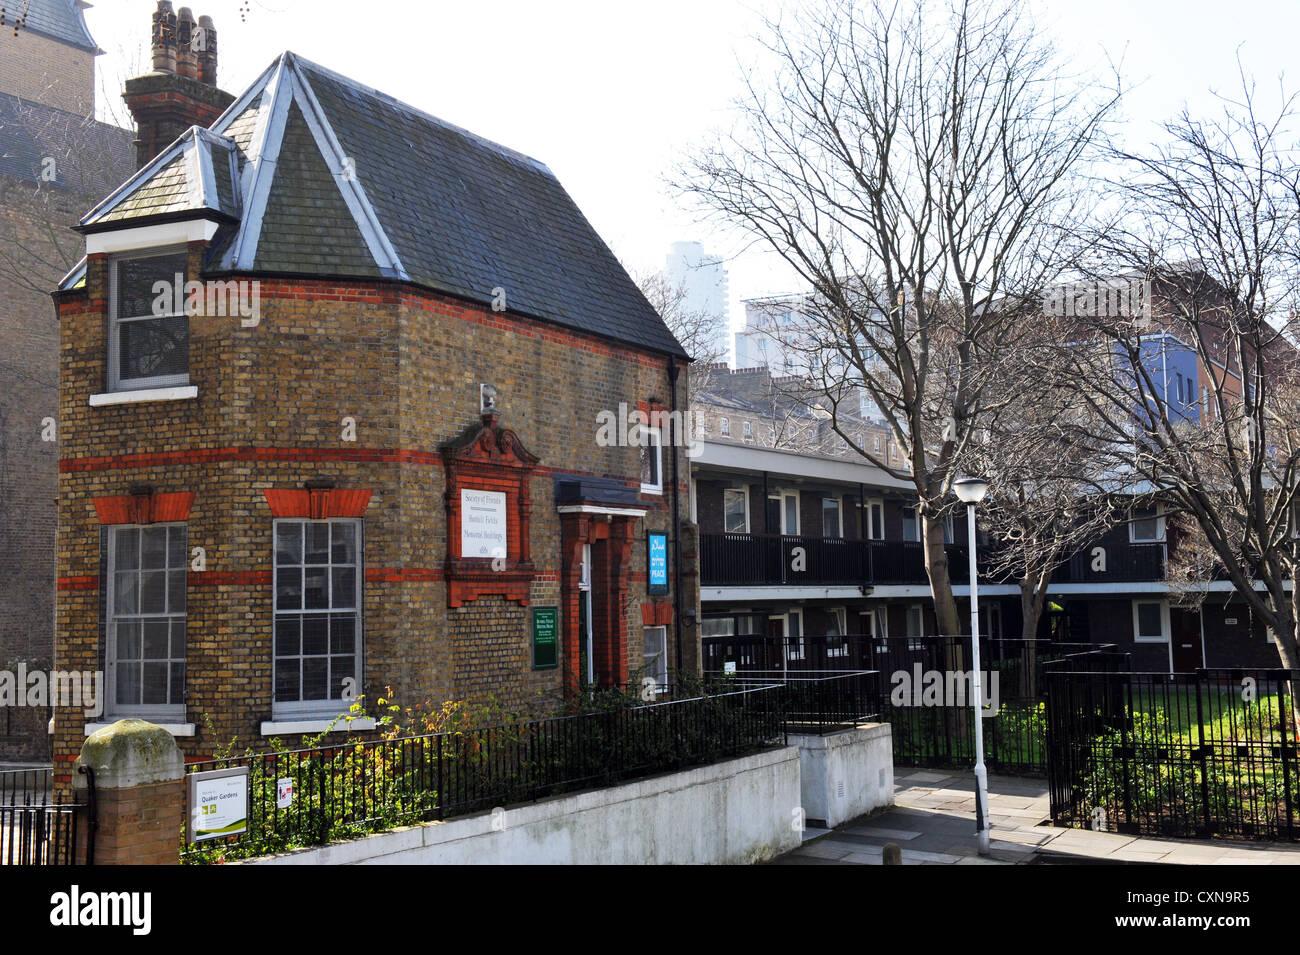 Quaker Meeting House Bunhill Fields, Islington London set amongst social housing. - Stock Image